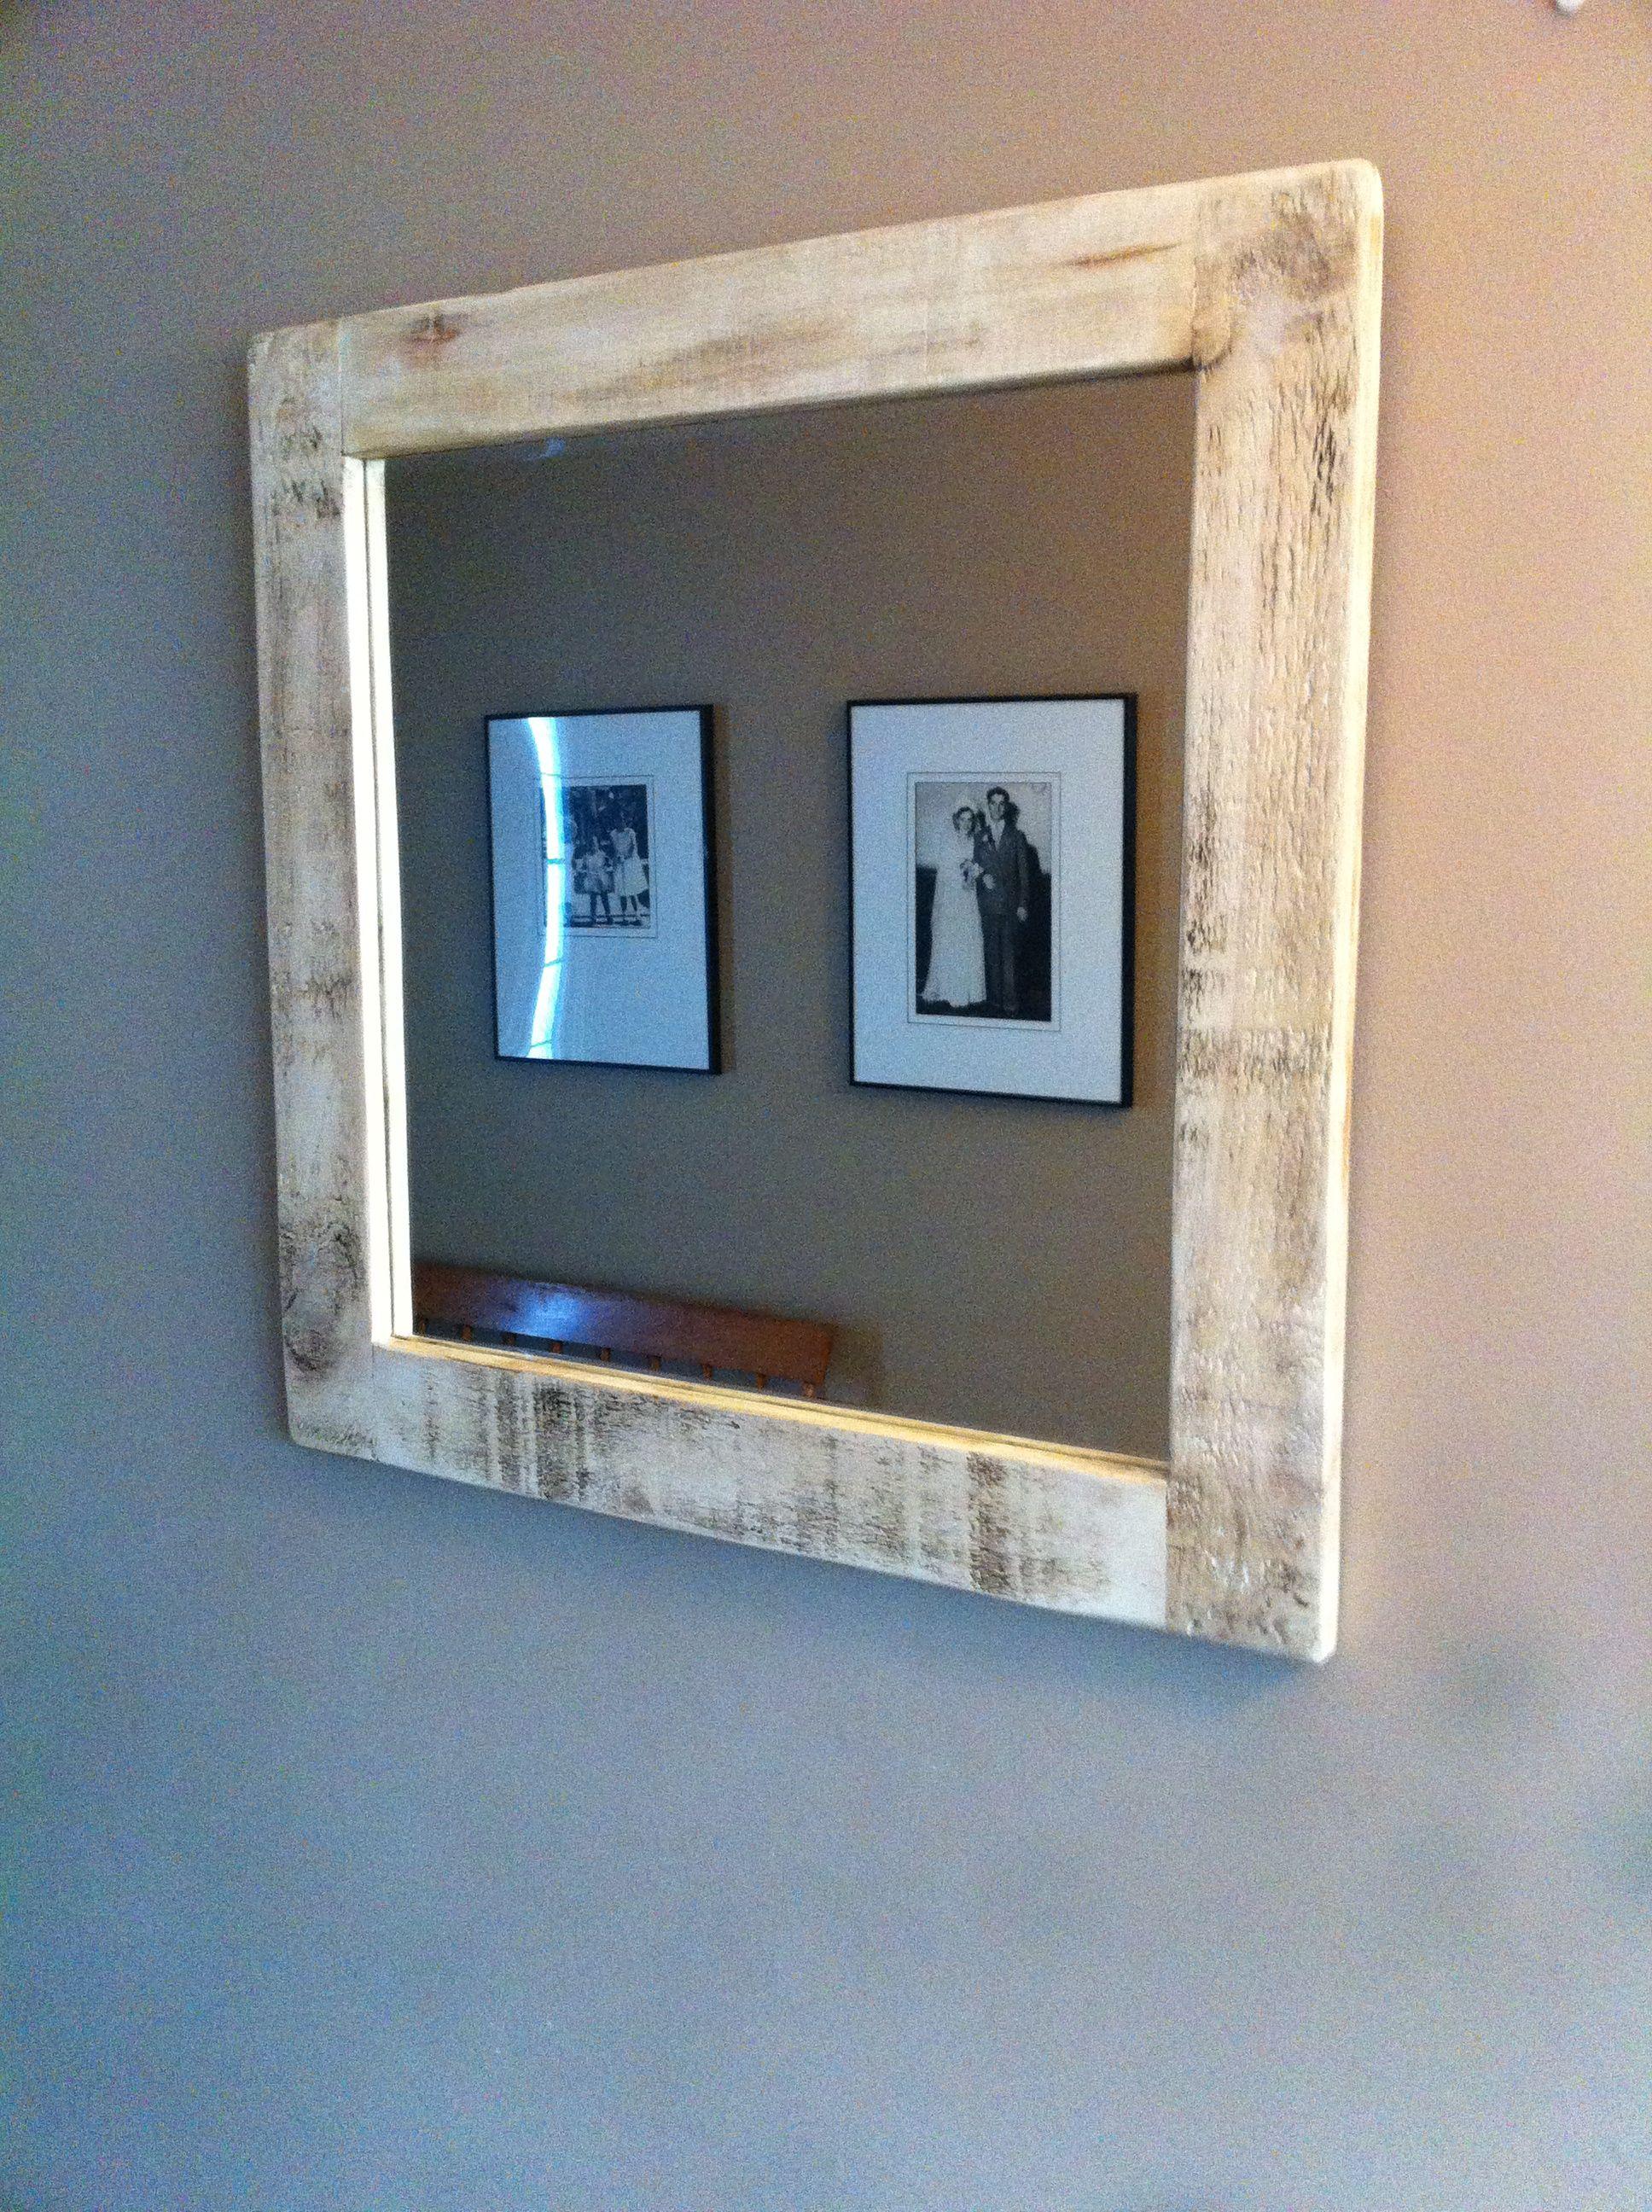 barn board mirror (With images) | Barn board mirror, Barn ...